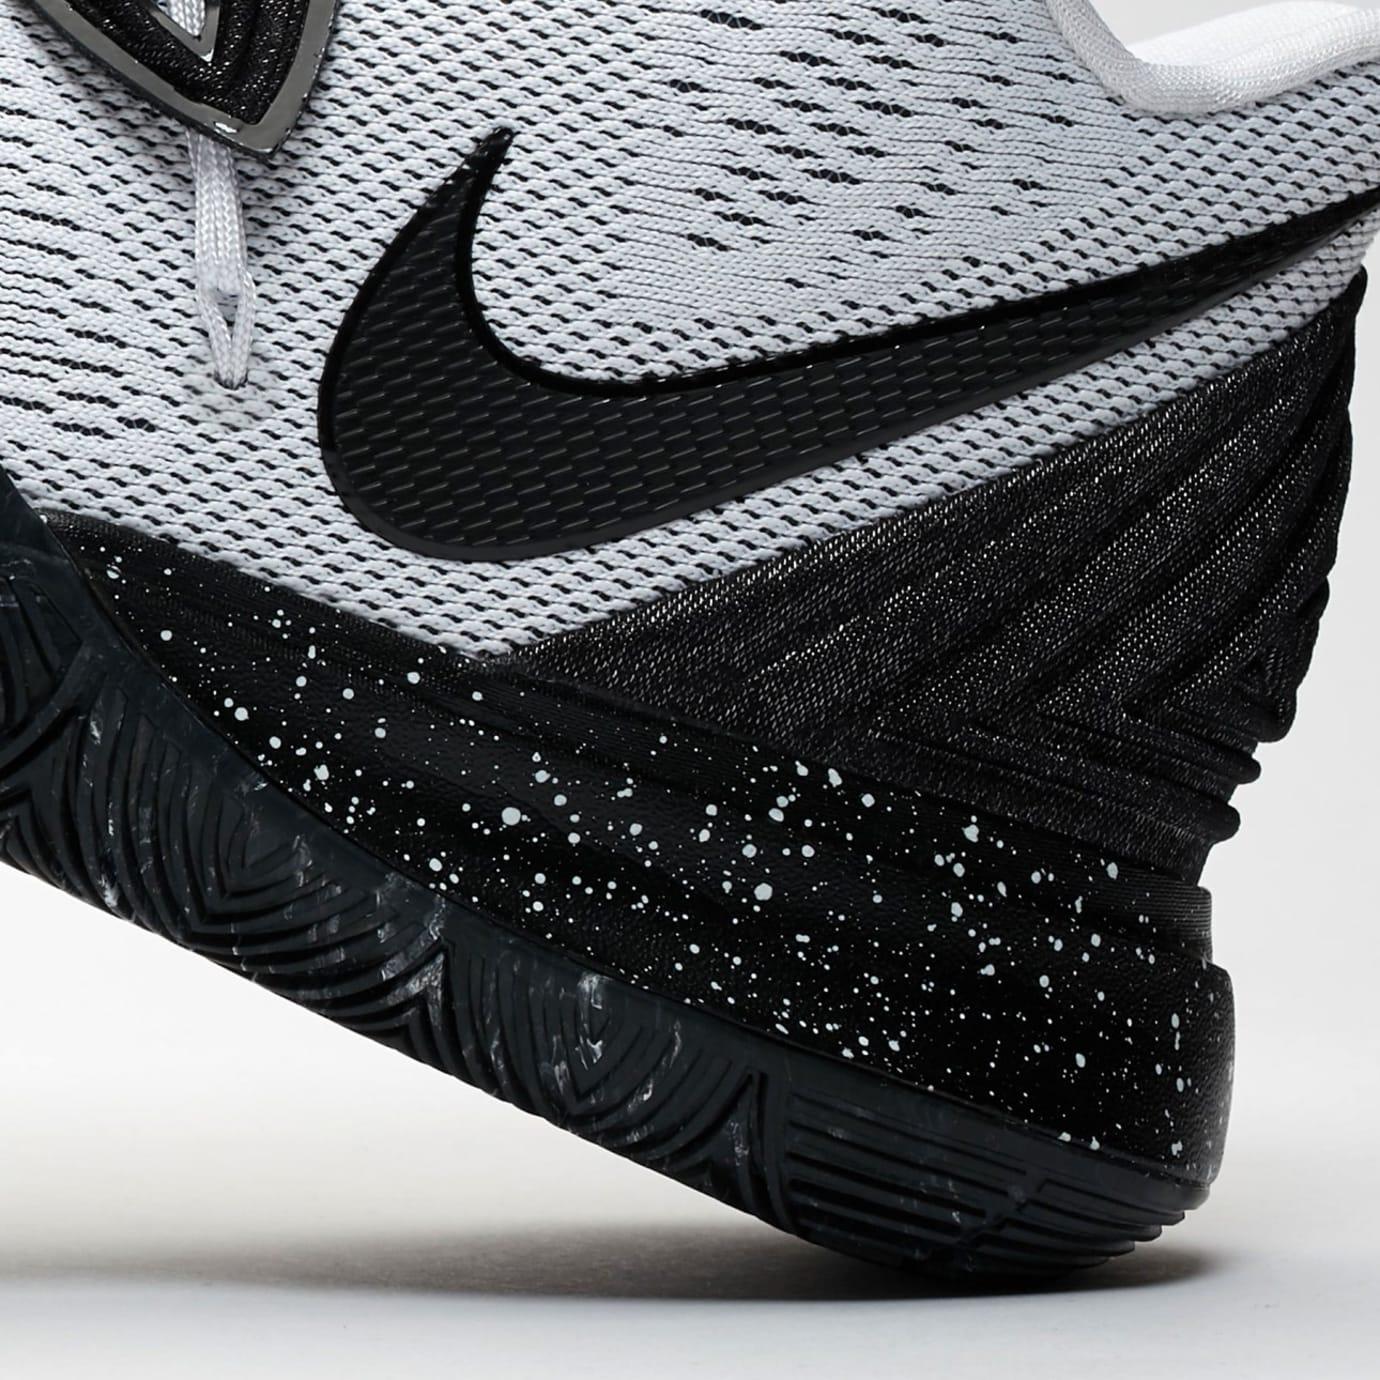 248b9847006 Image via SneakersNStuff Nike Kyrie 5 'White/Black' AO2918-100 (Detail 2)